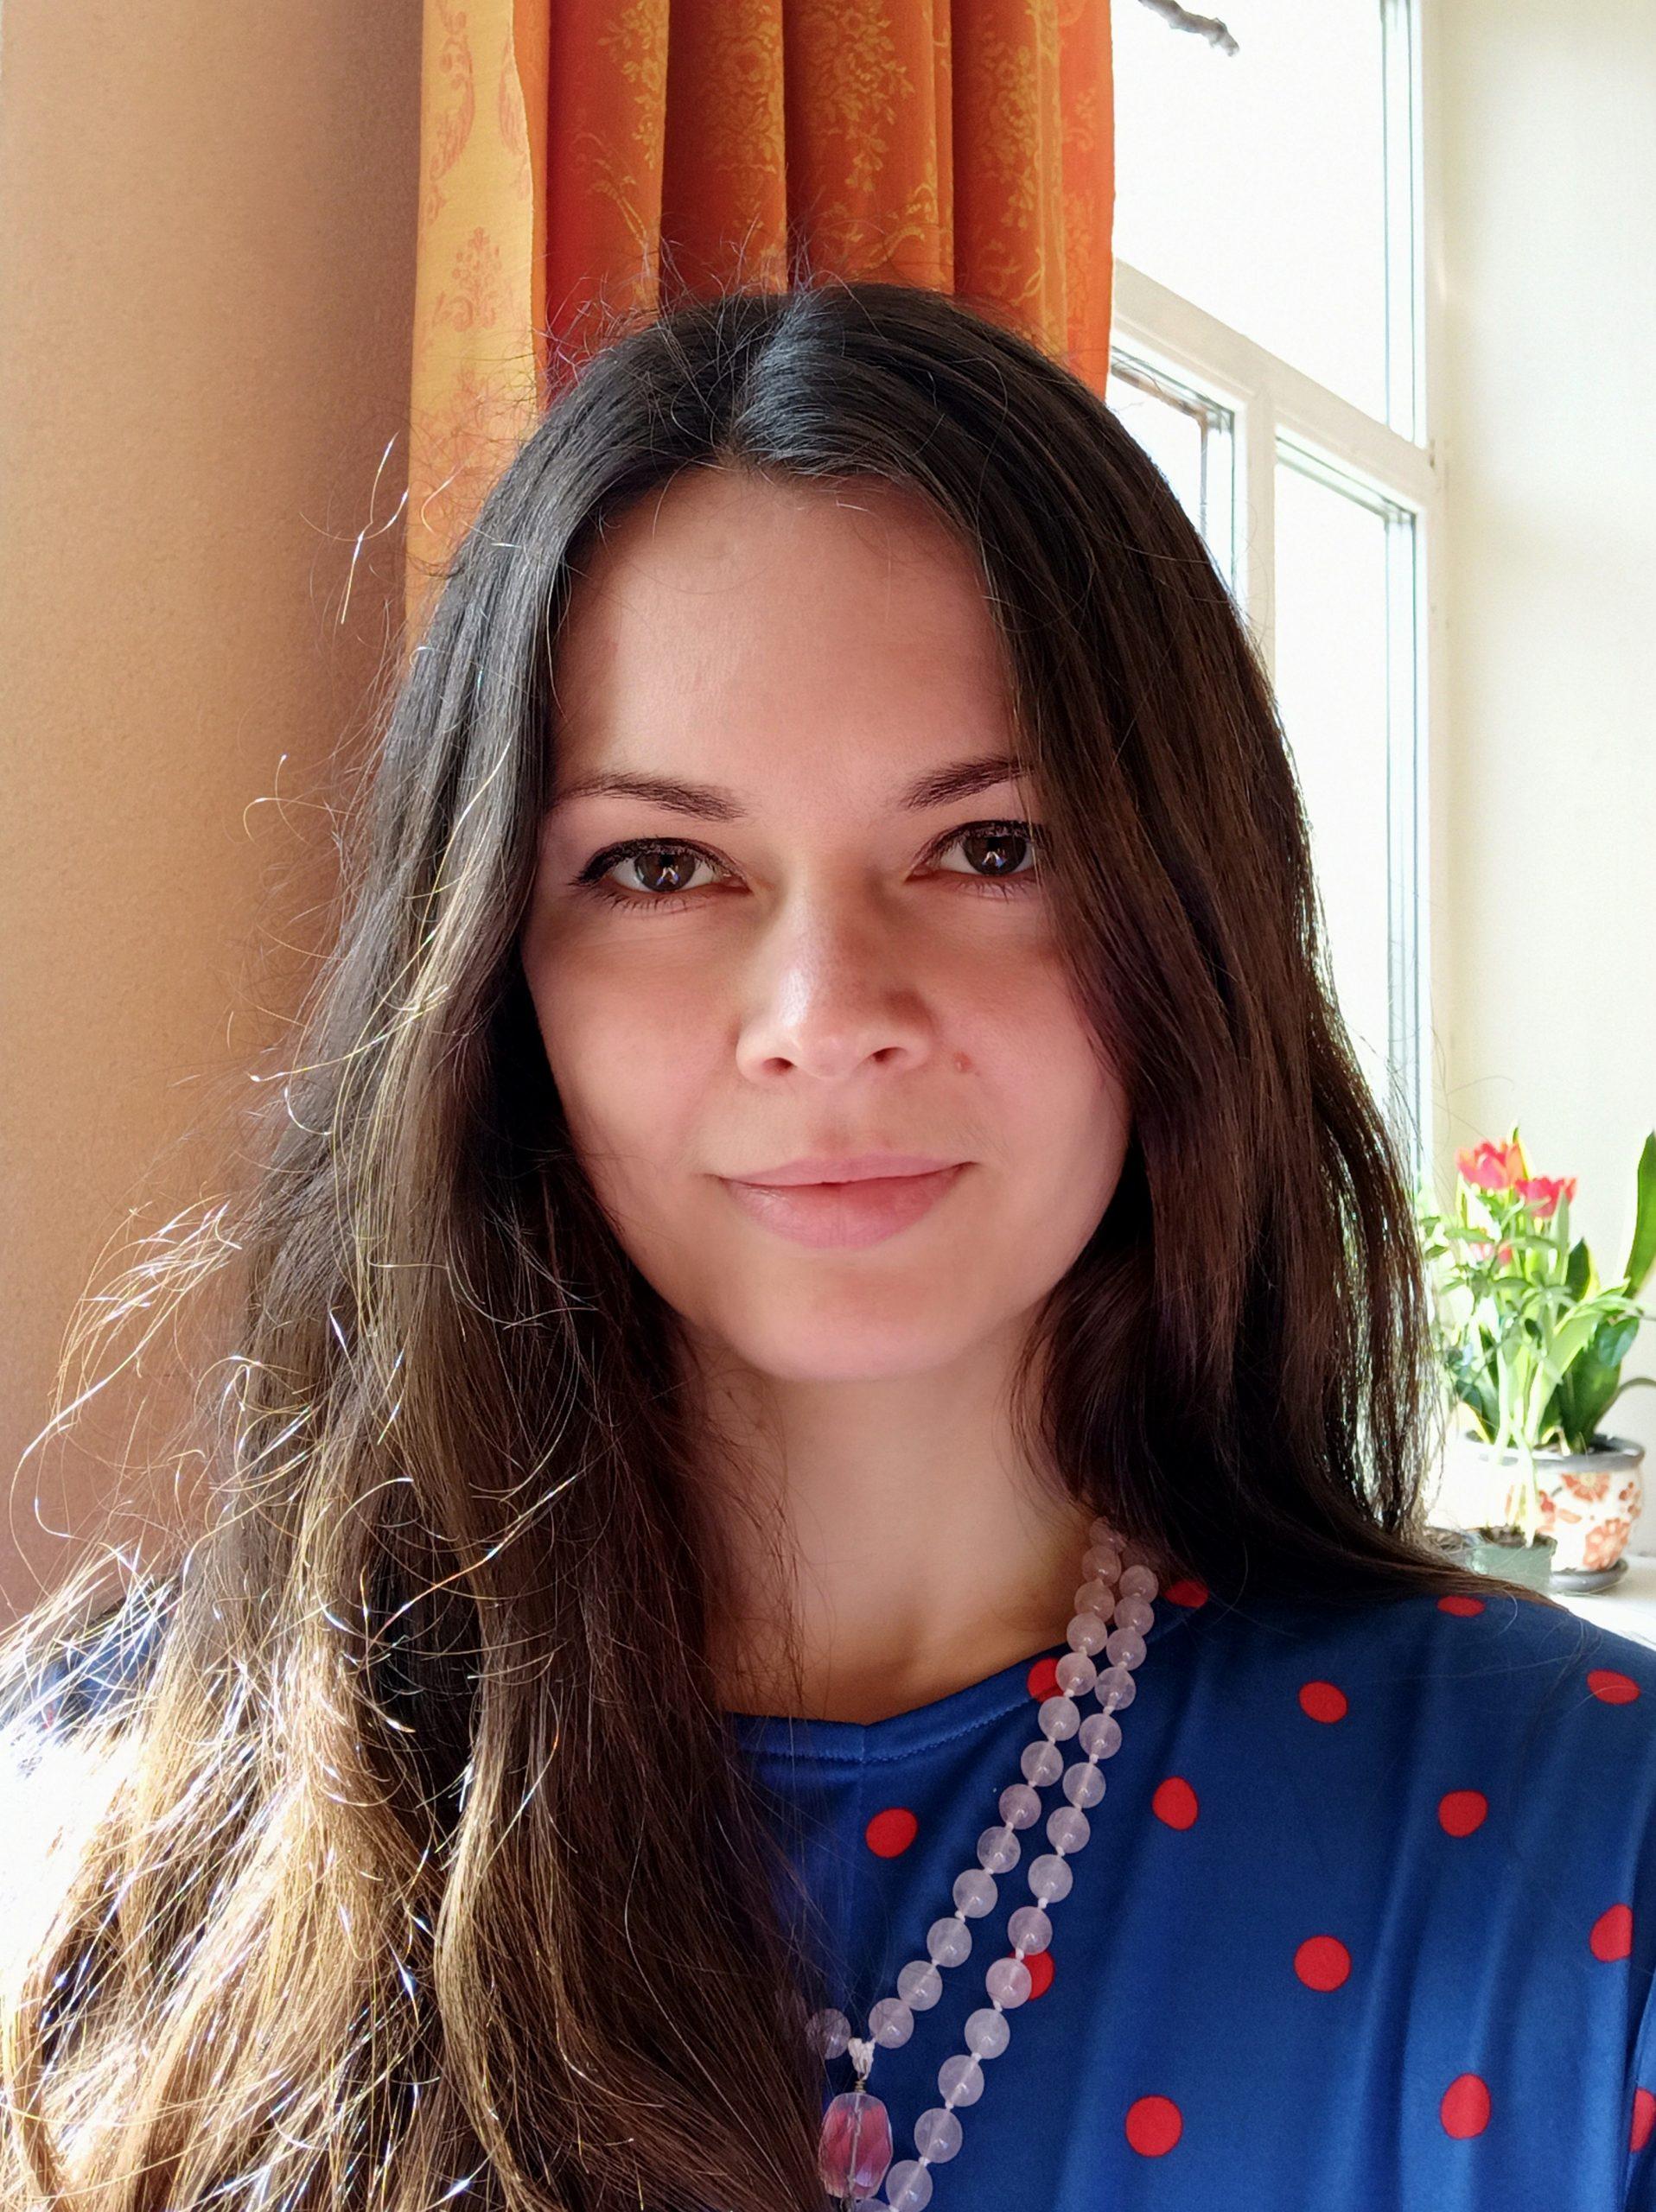 Egidija Zasytyte